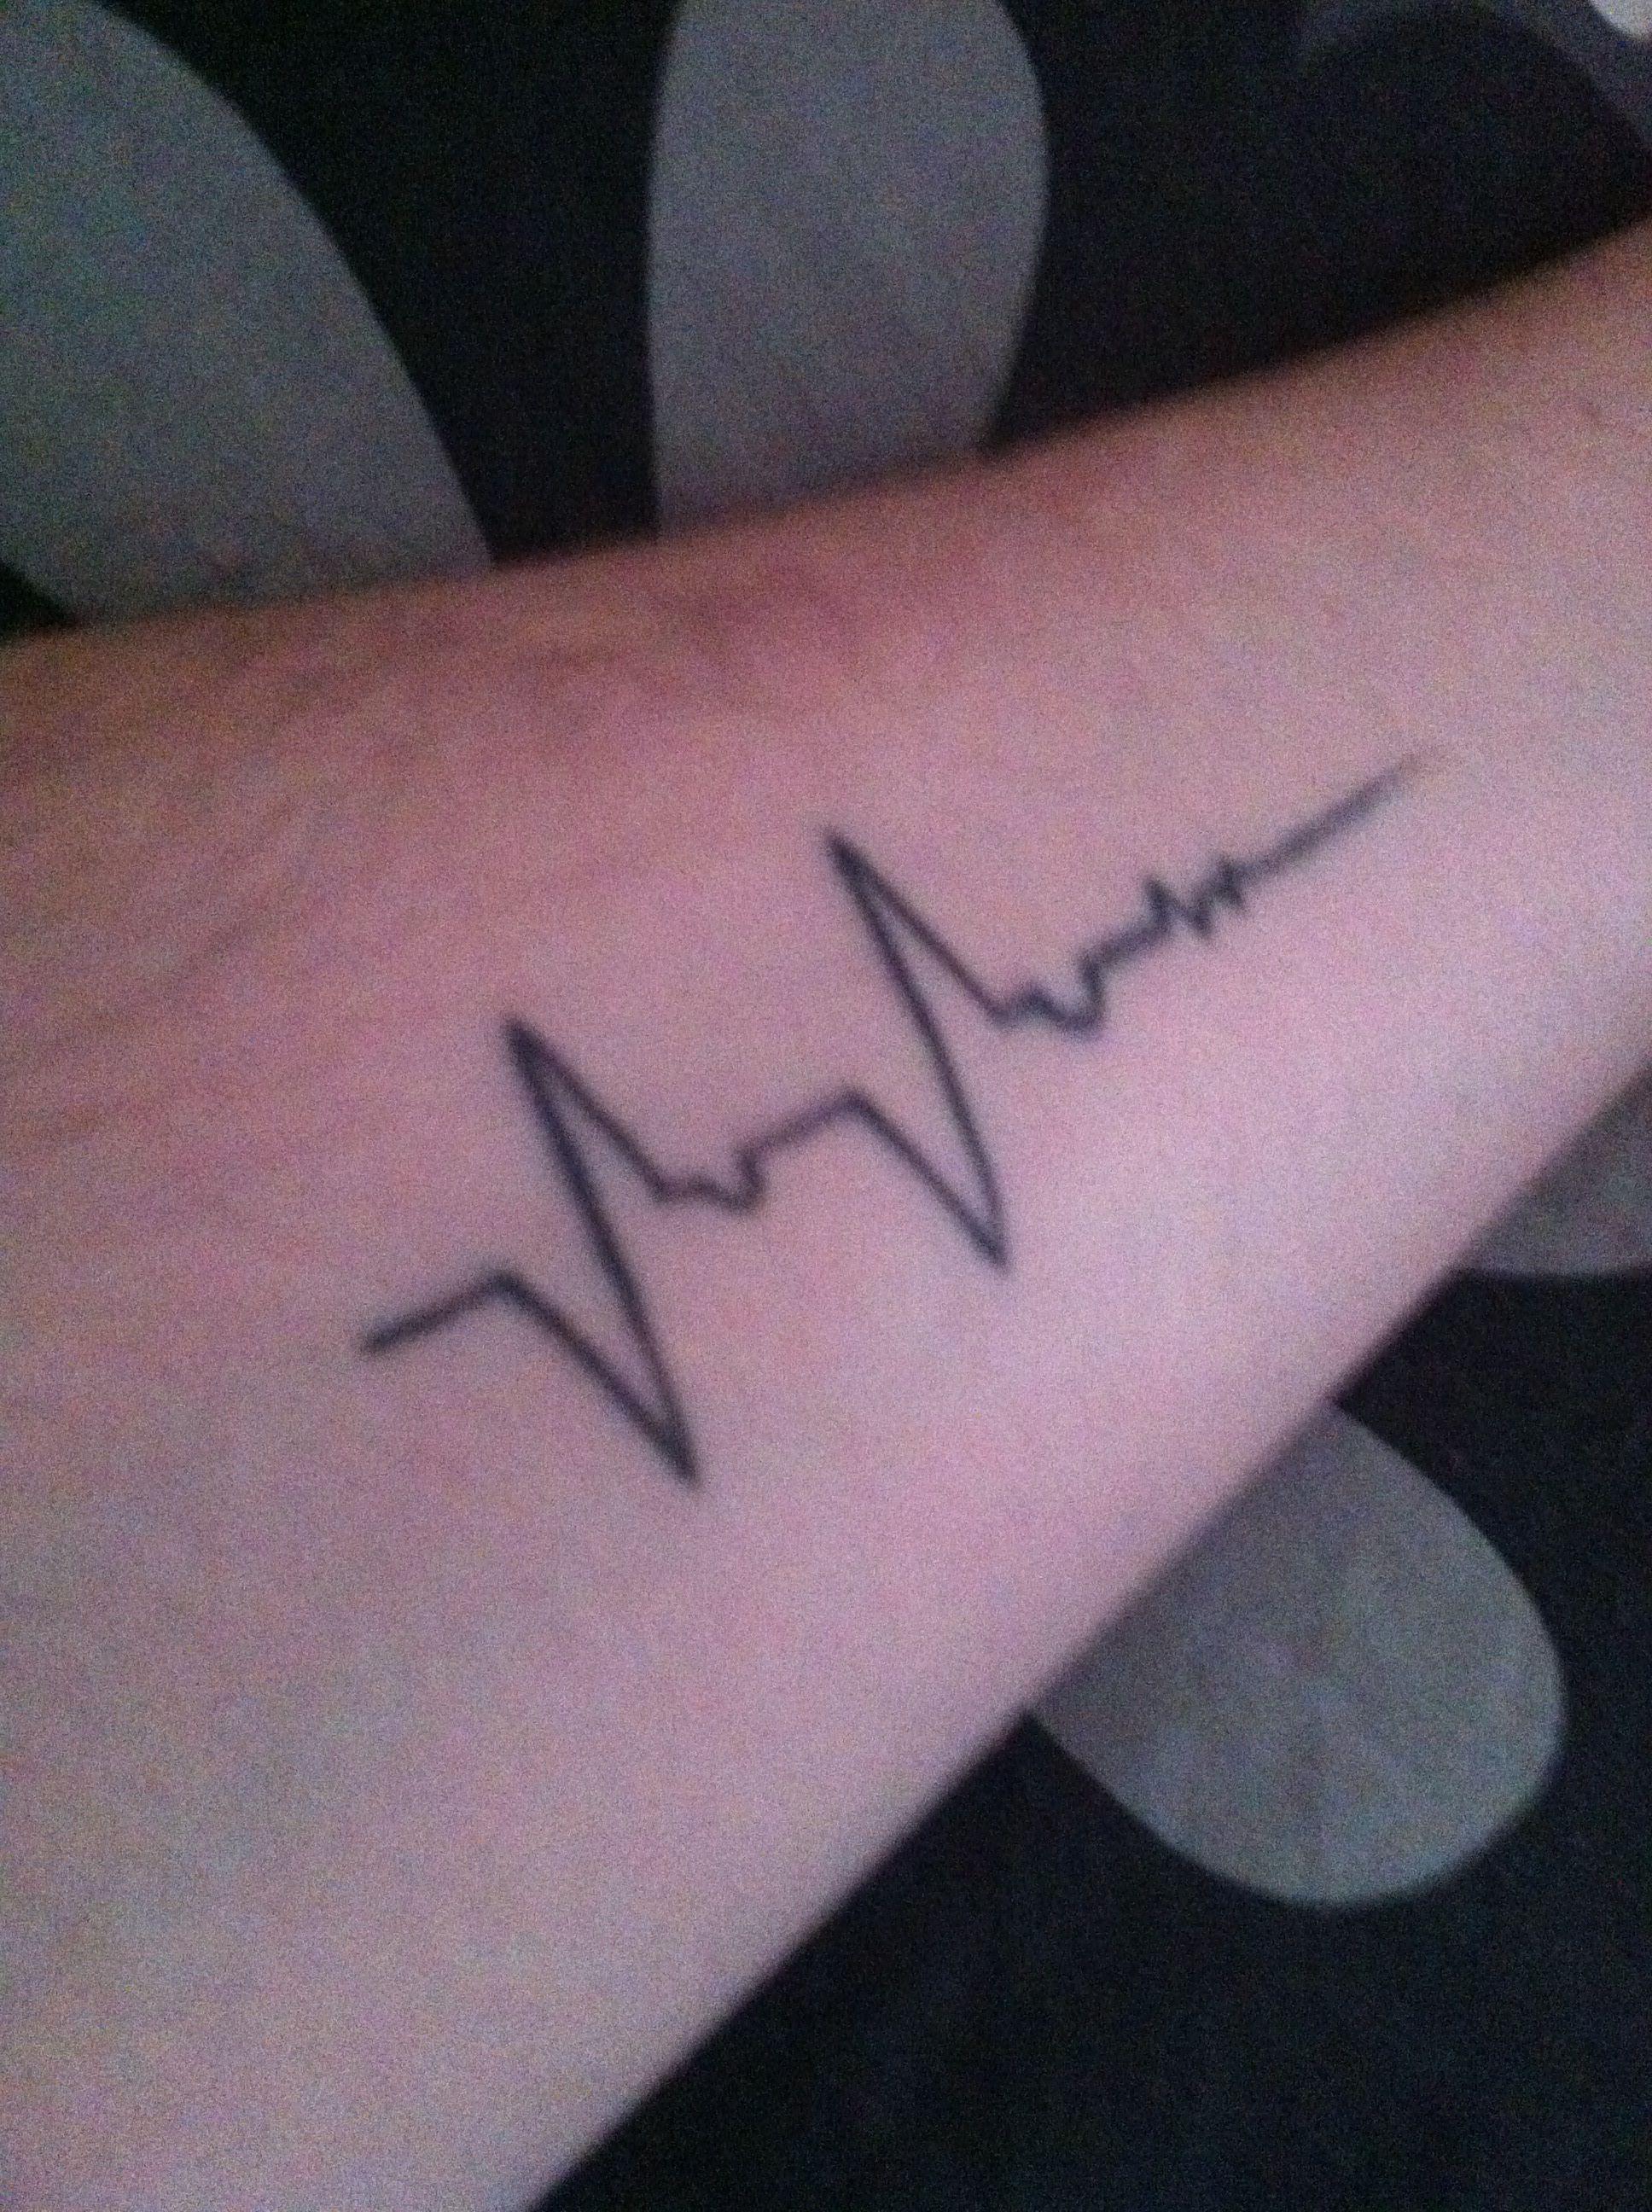 0194b1007 My ECG tattoo | Tattoo | Ecg tattoo, Tattoos, Tattoo quotes